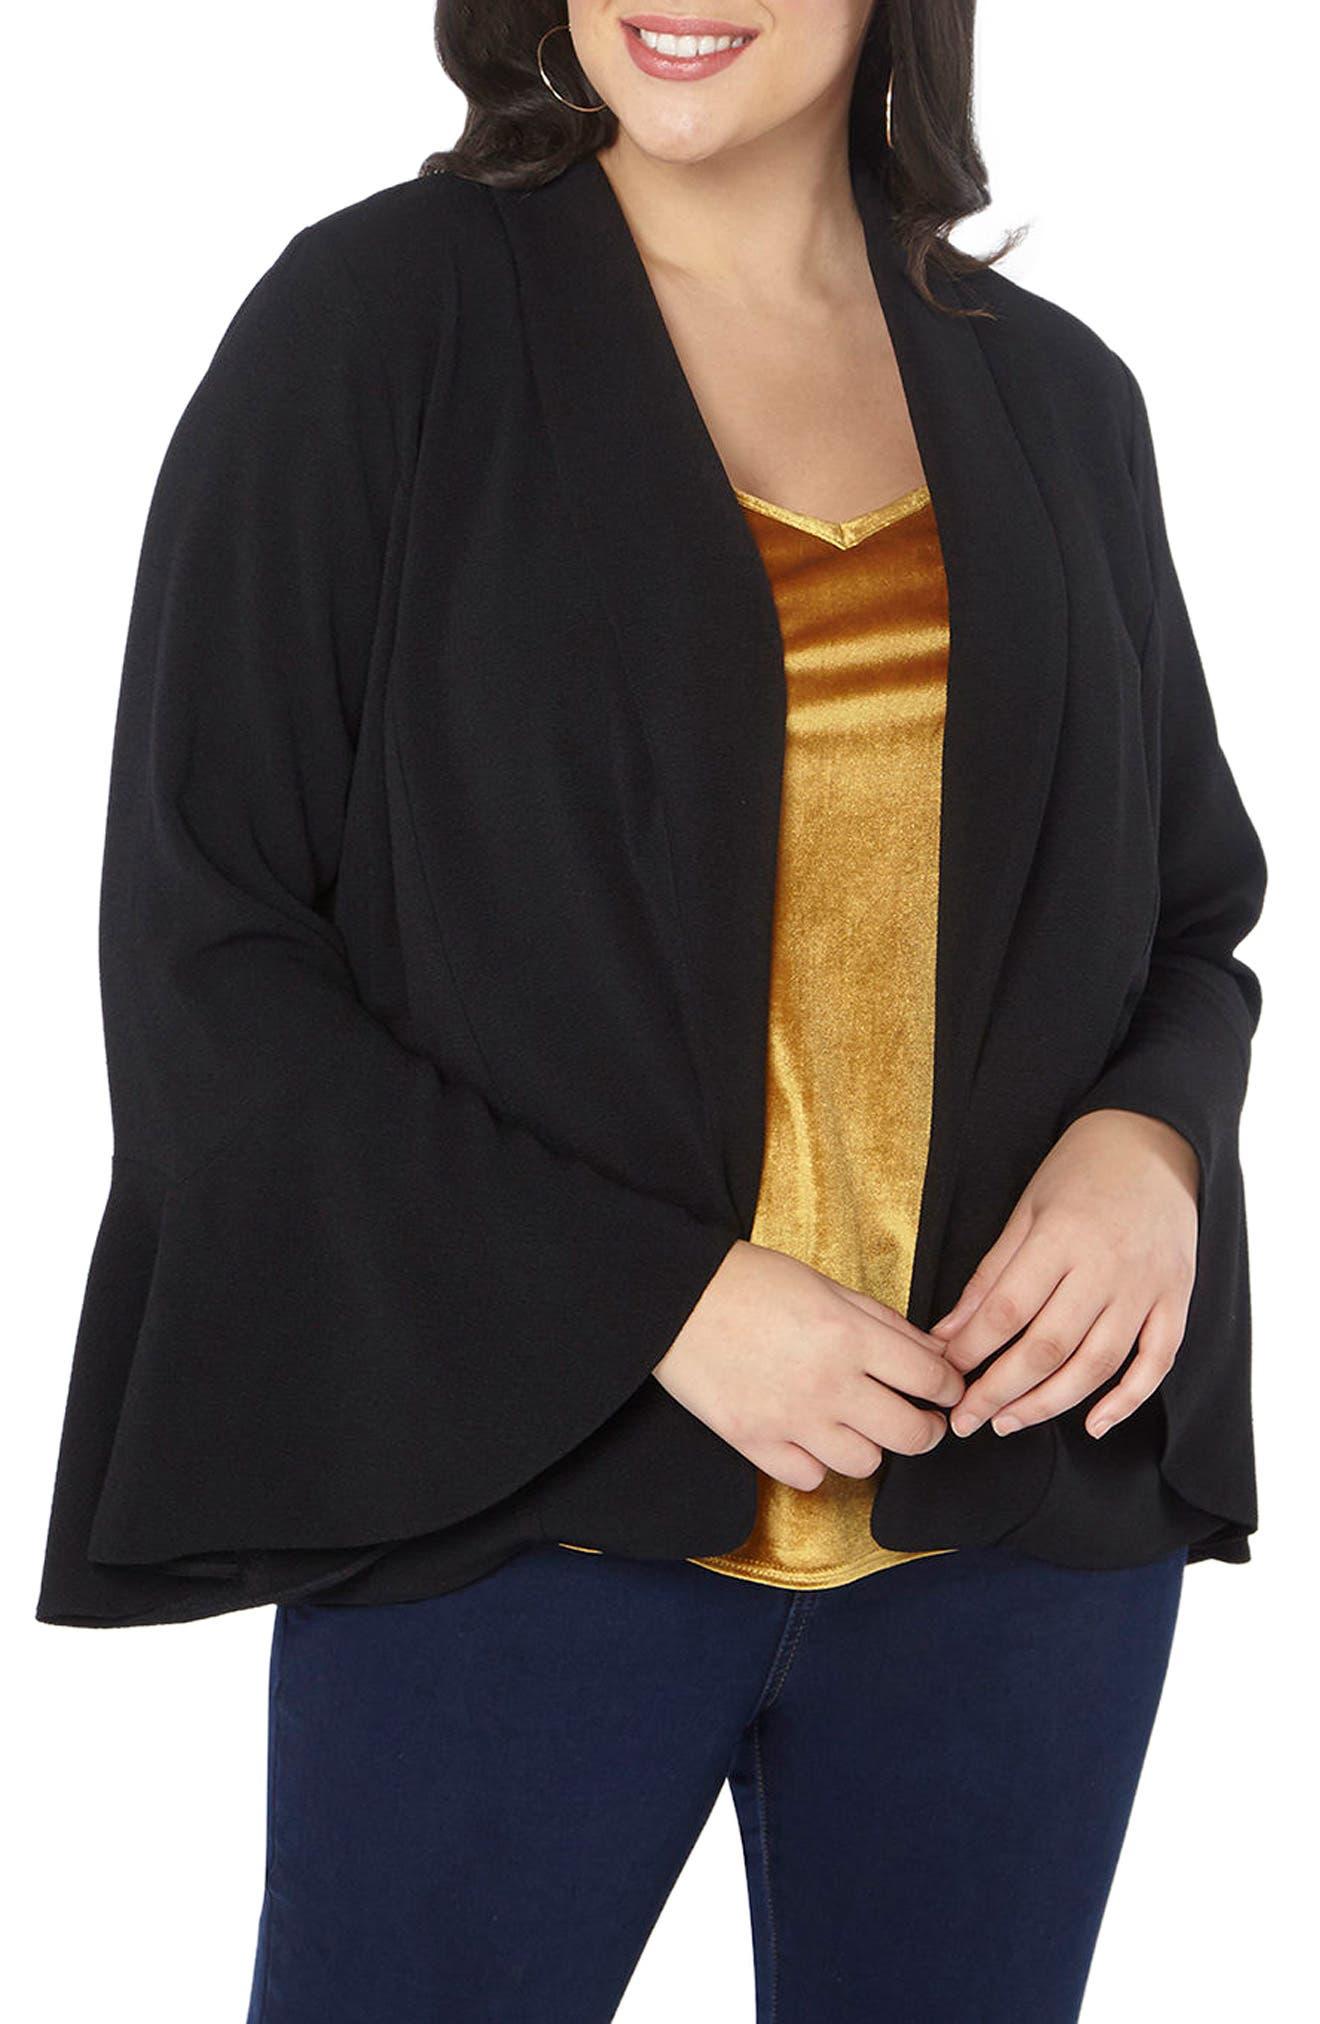 Alternate Image 1 Selected - Evans Bell Sleeve Crepe Jacket (Plus Size)